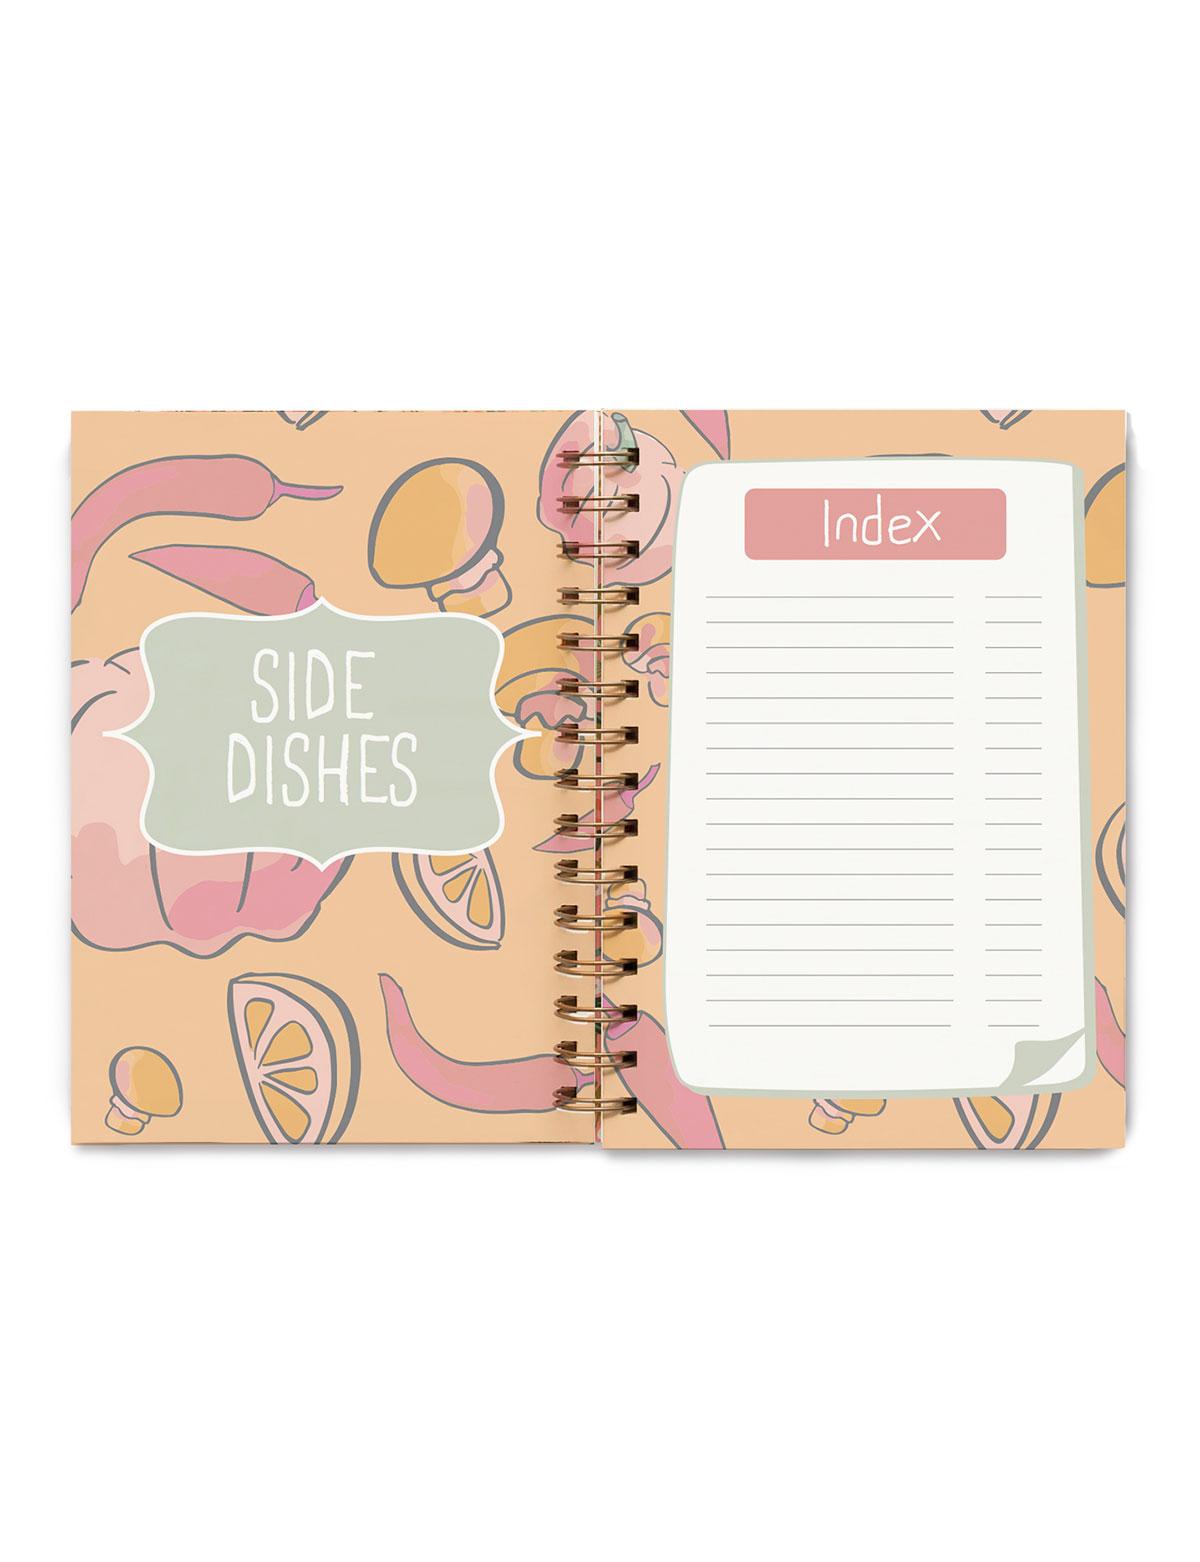 Blank Recipe Book, Journal, Notebook